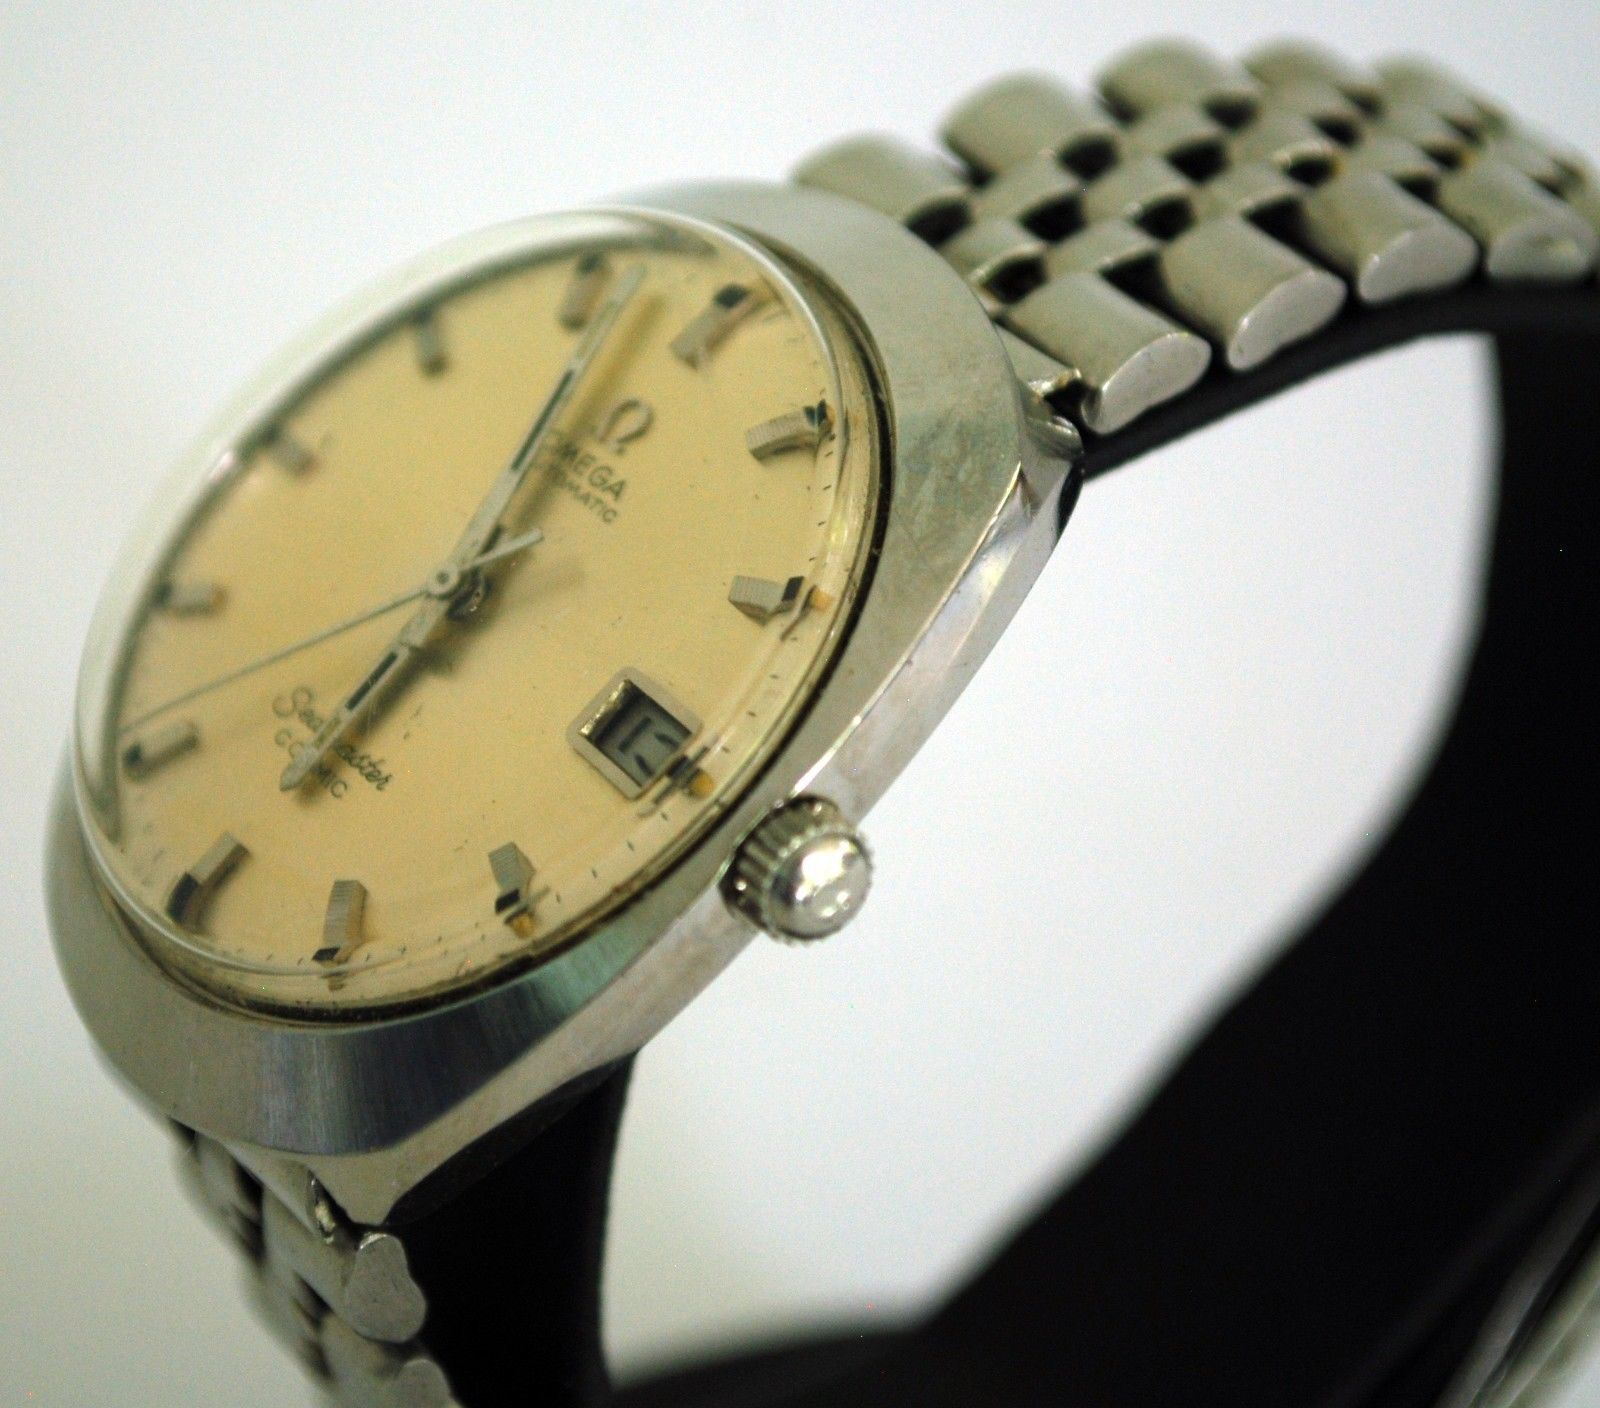 Vintage 1970's Omega Seamaster Cosmic Wristwatch, Mint!